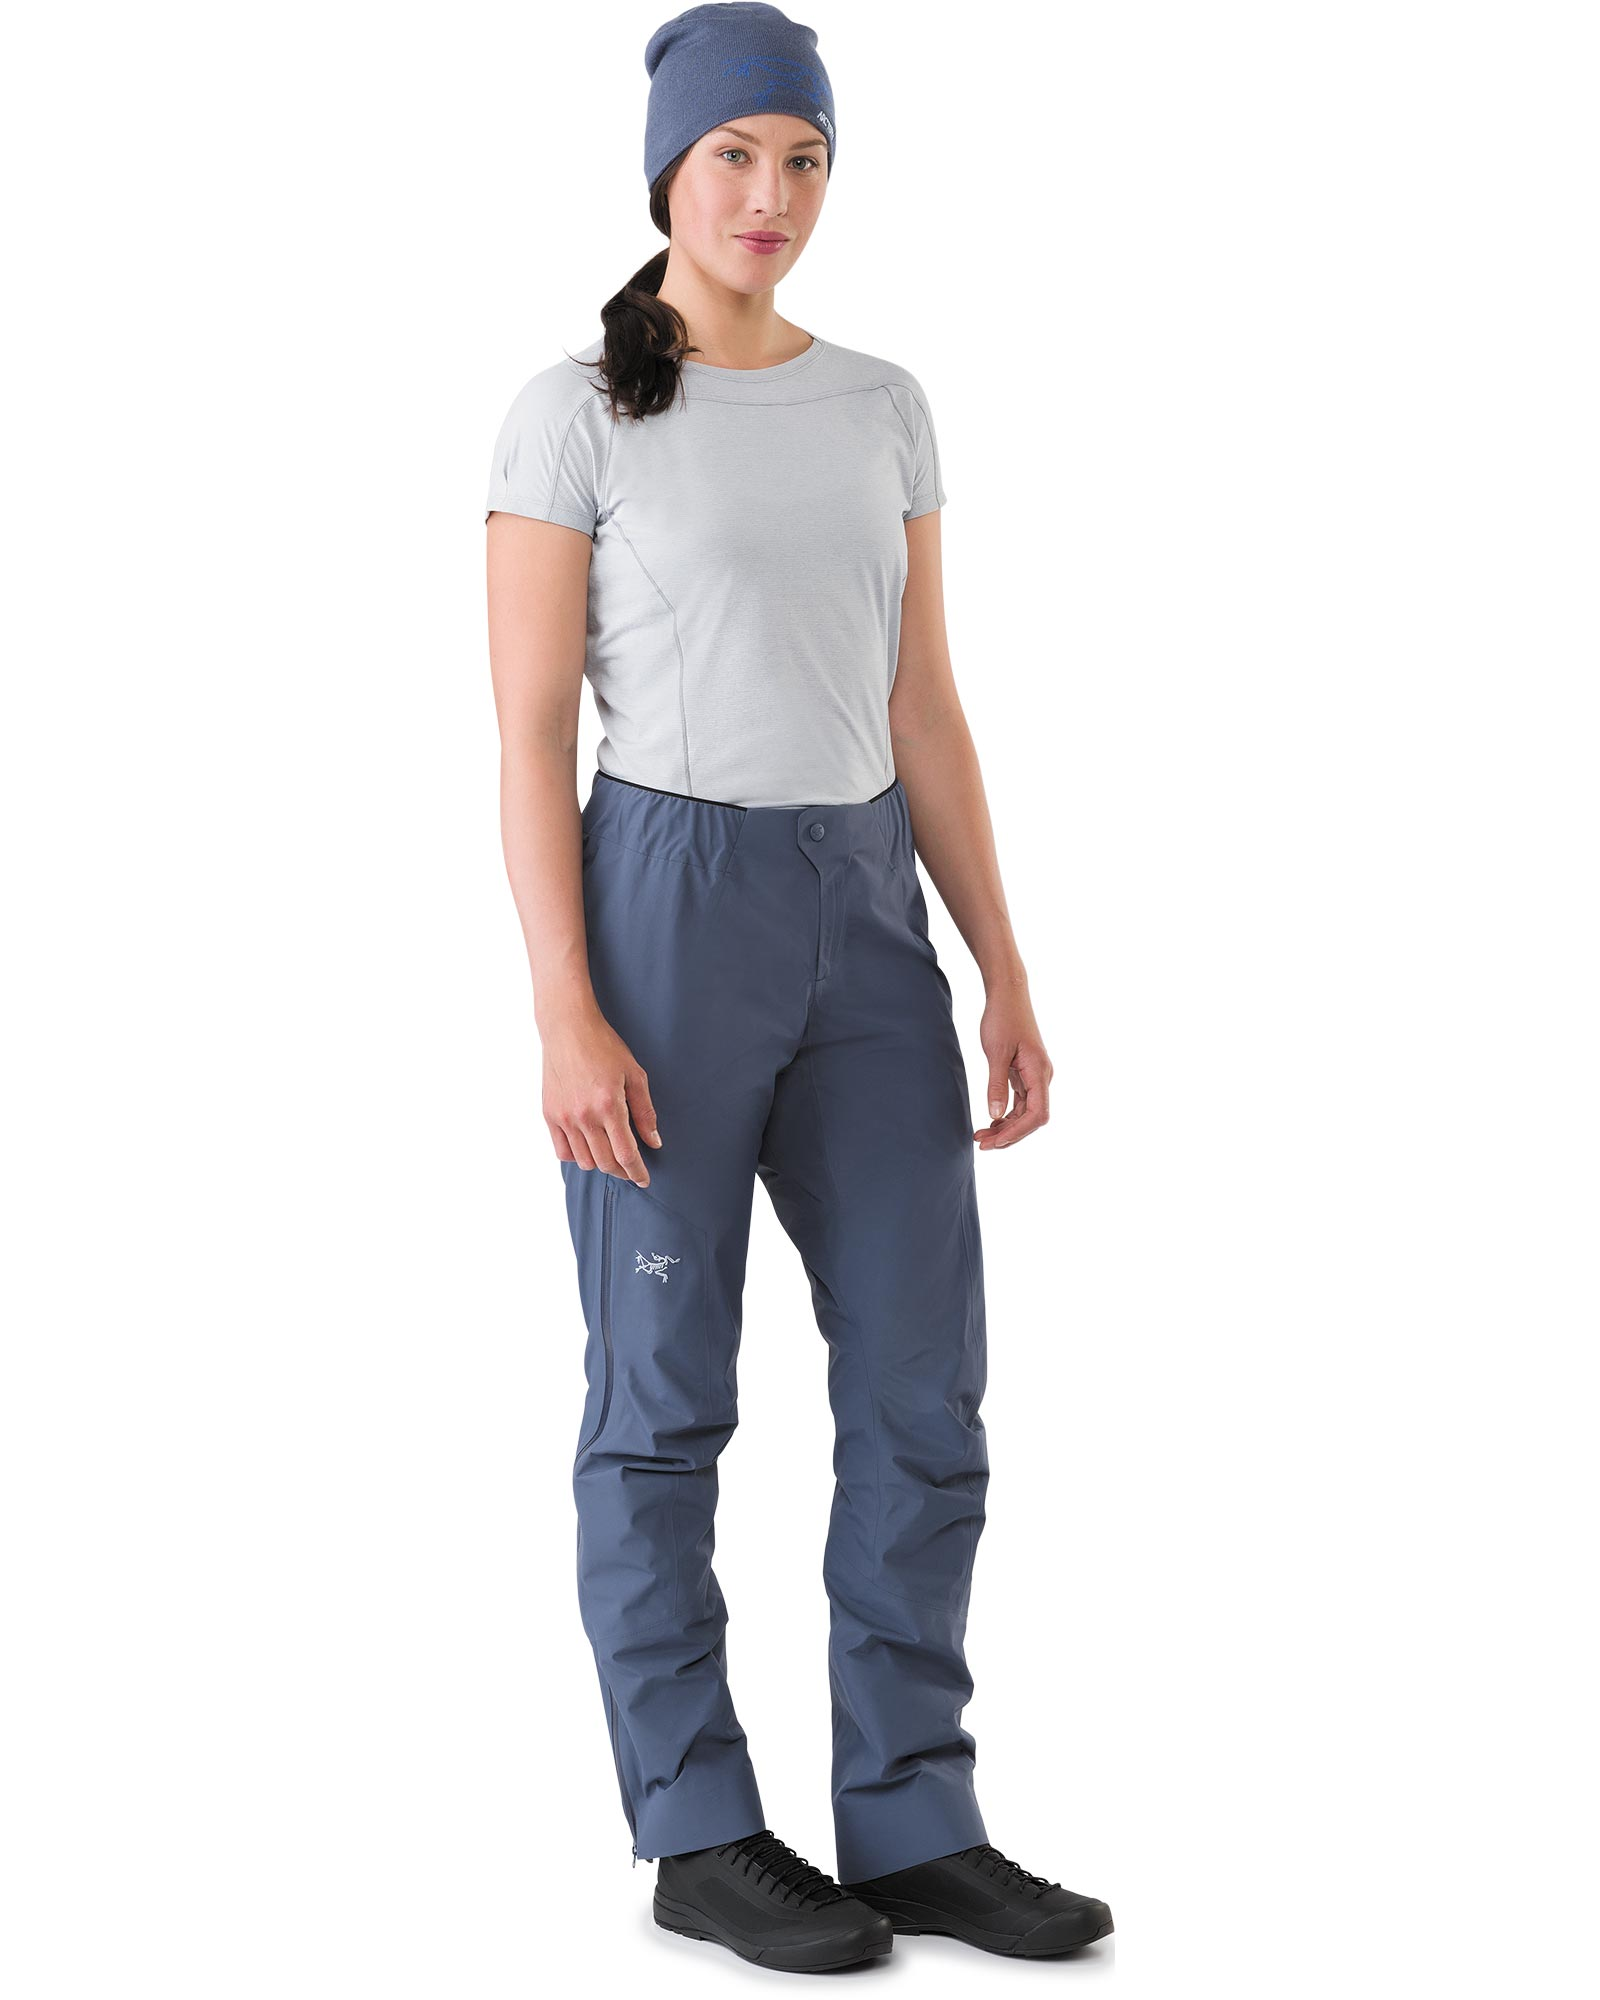 Arc'teryx Zeta SL GORE-TEX PACLITE Plus Women's Waterproof Pants